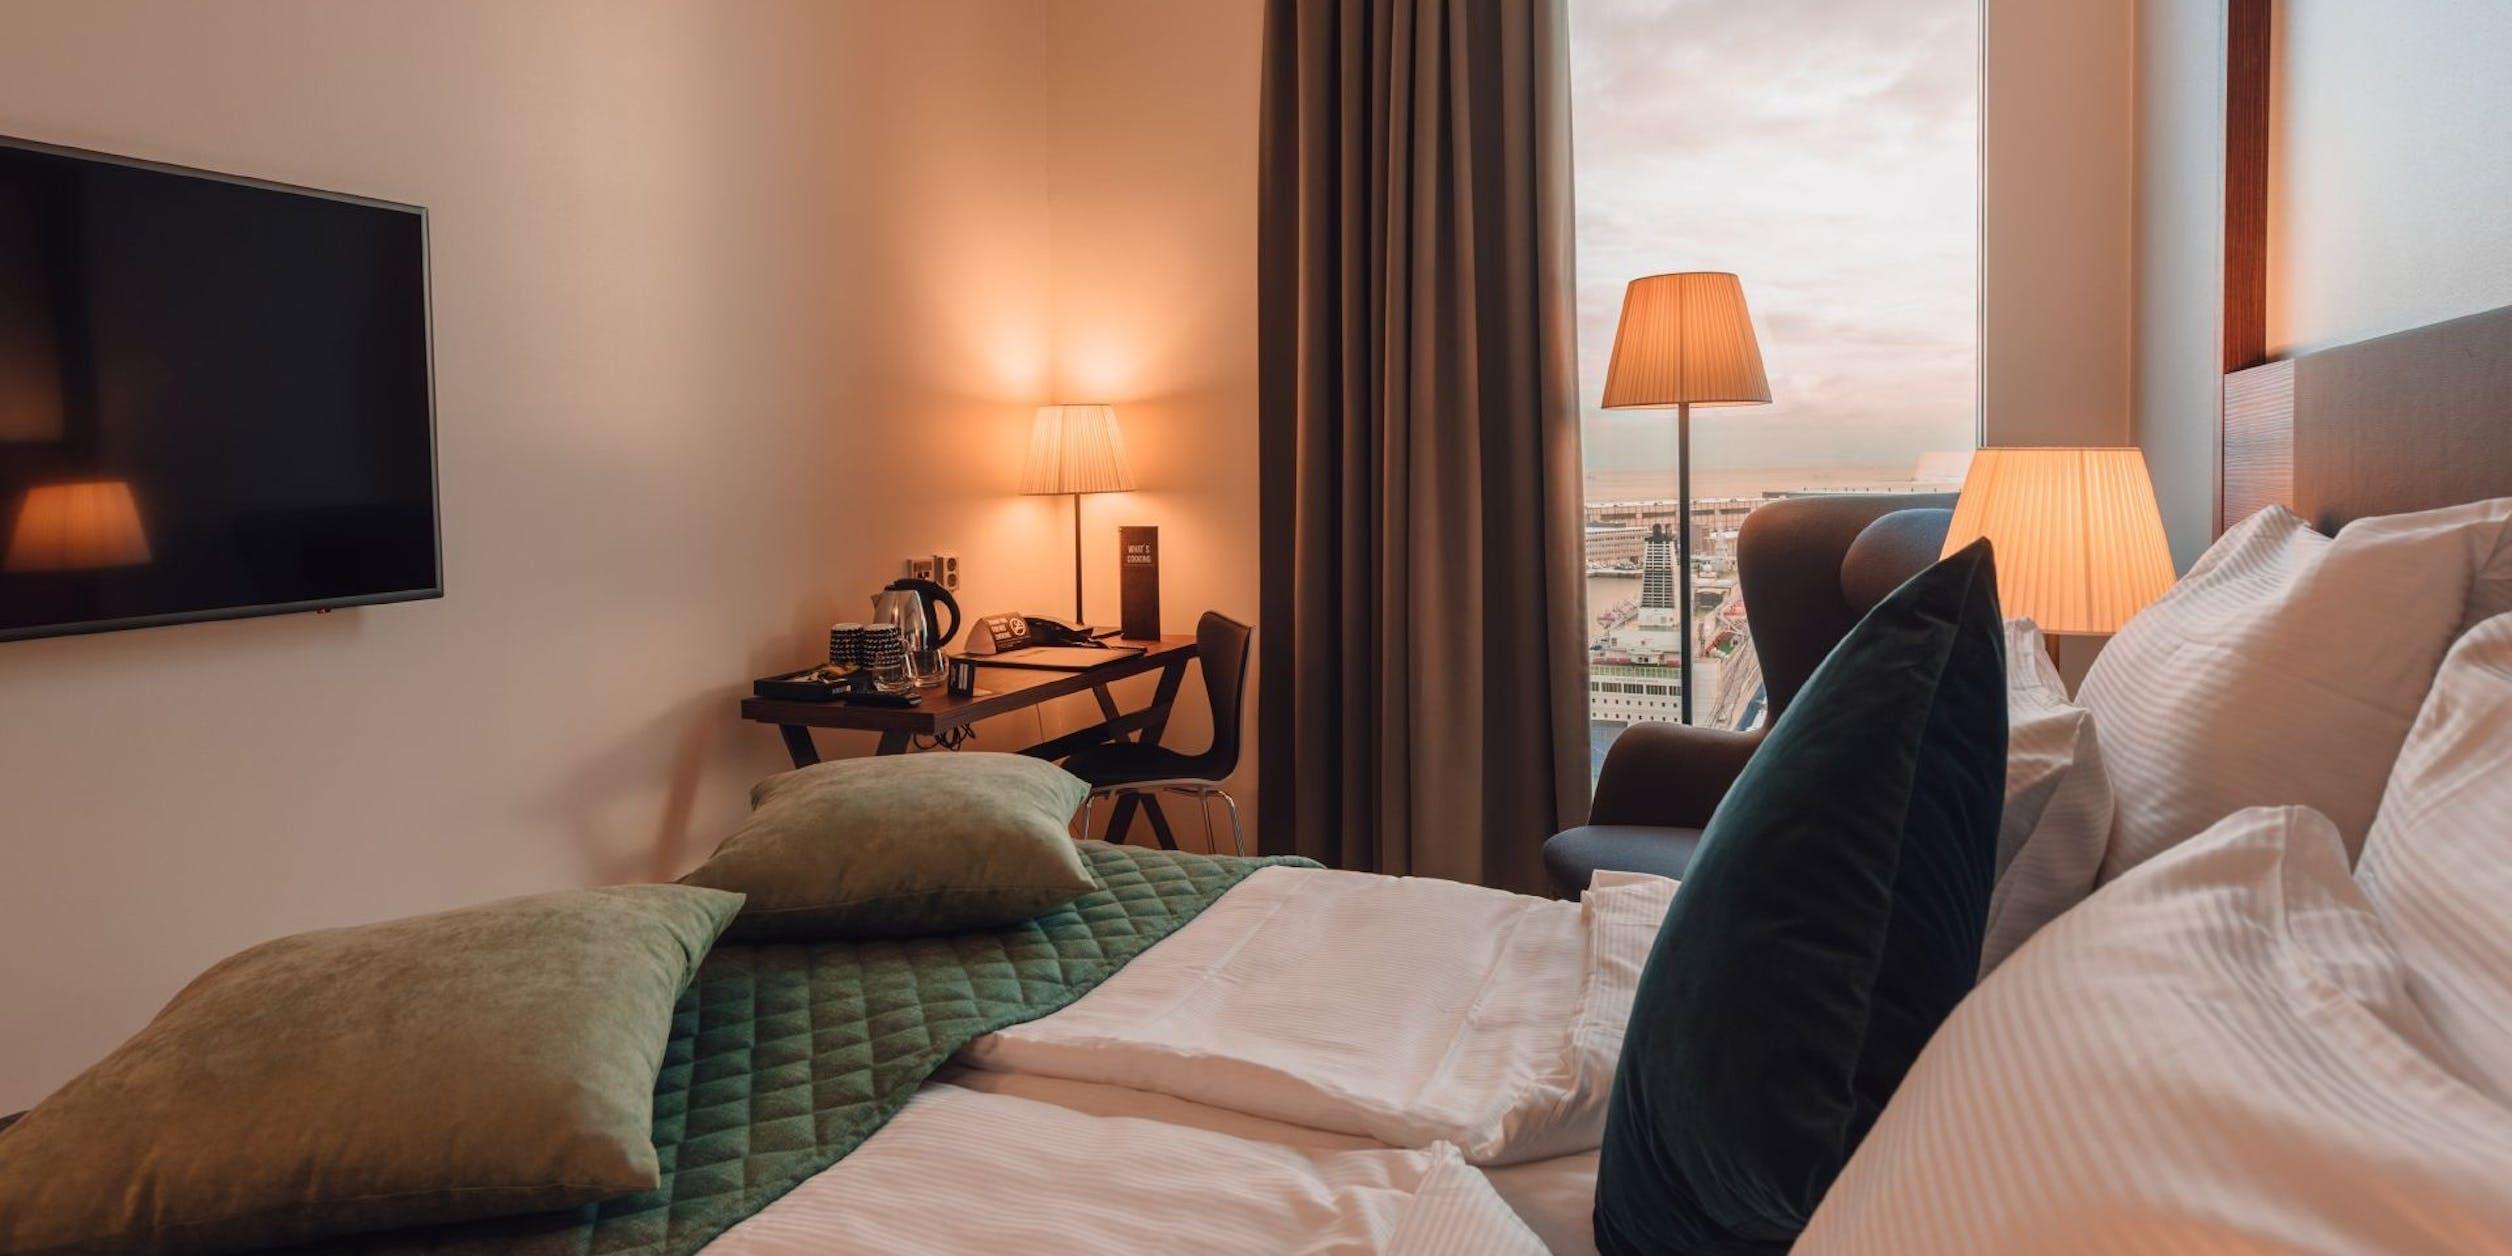 Clarion Hotel Helsinki bedroom image